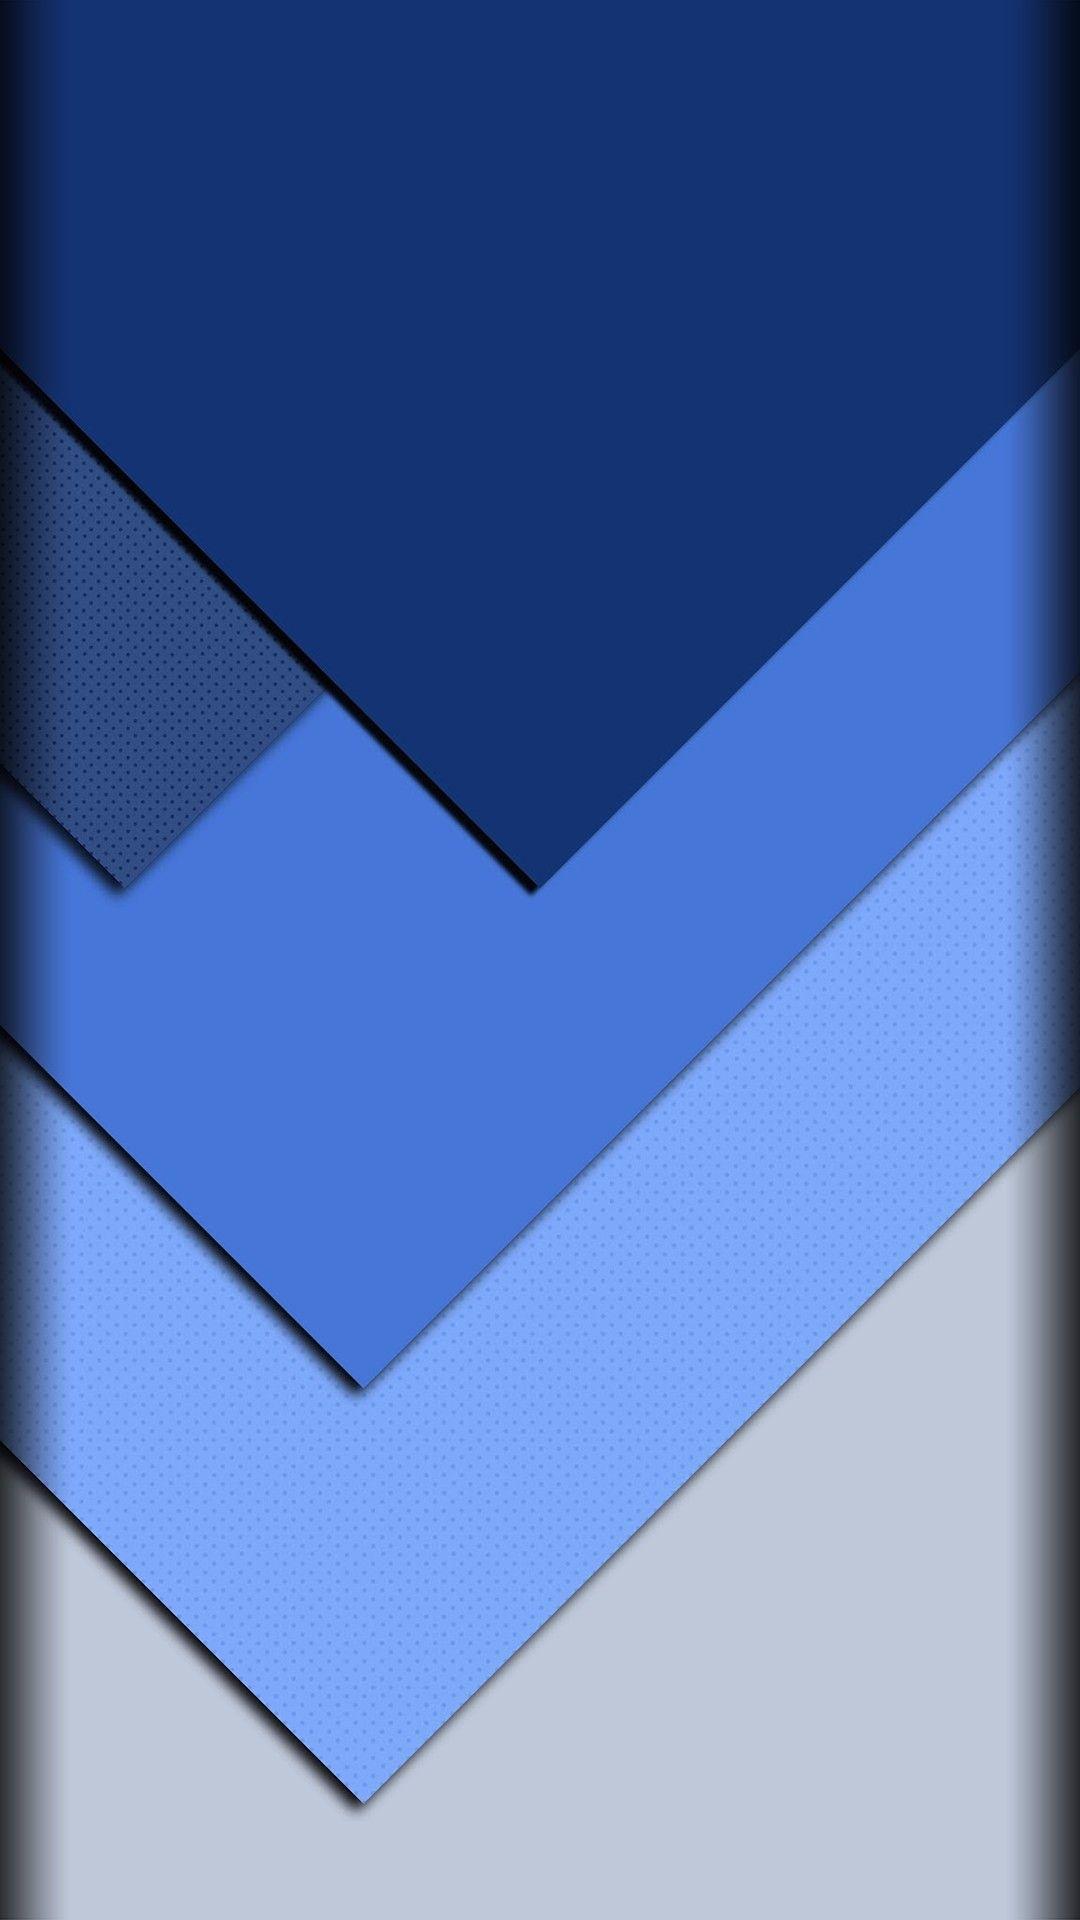 Samsung Iphone Edge Phone Telefon 3d Wallpaper Wallpaper Edge New Wallpaper Iphone Samsung Wallpaper